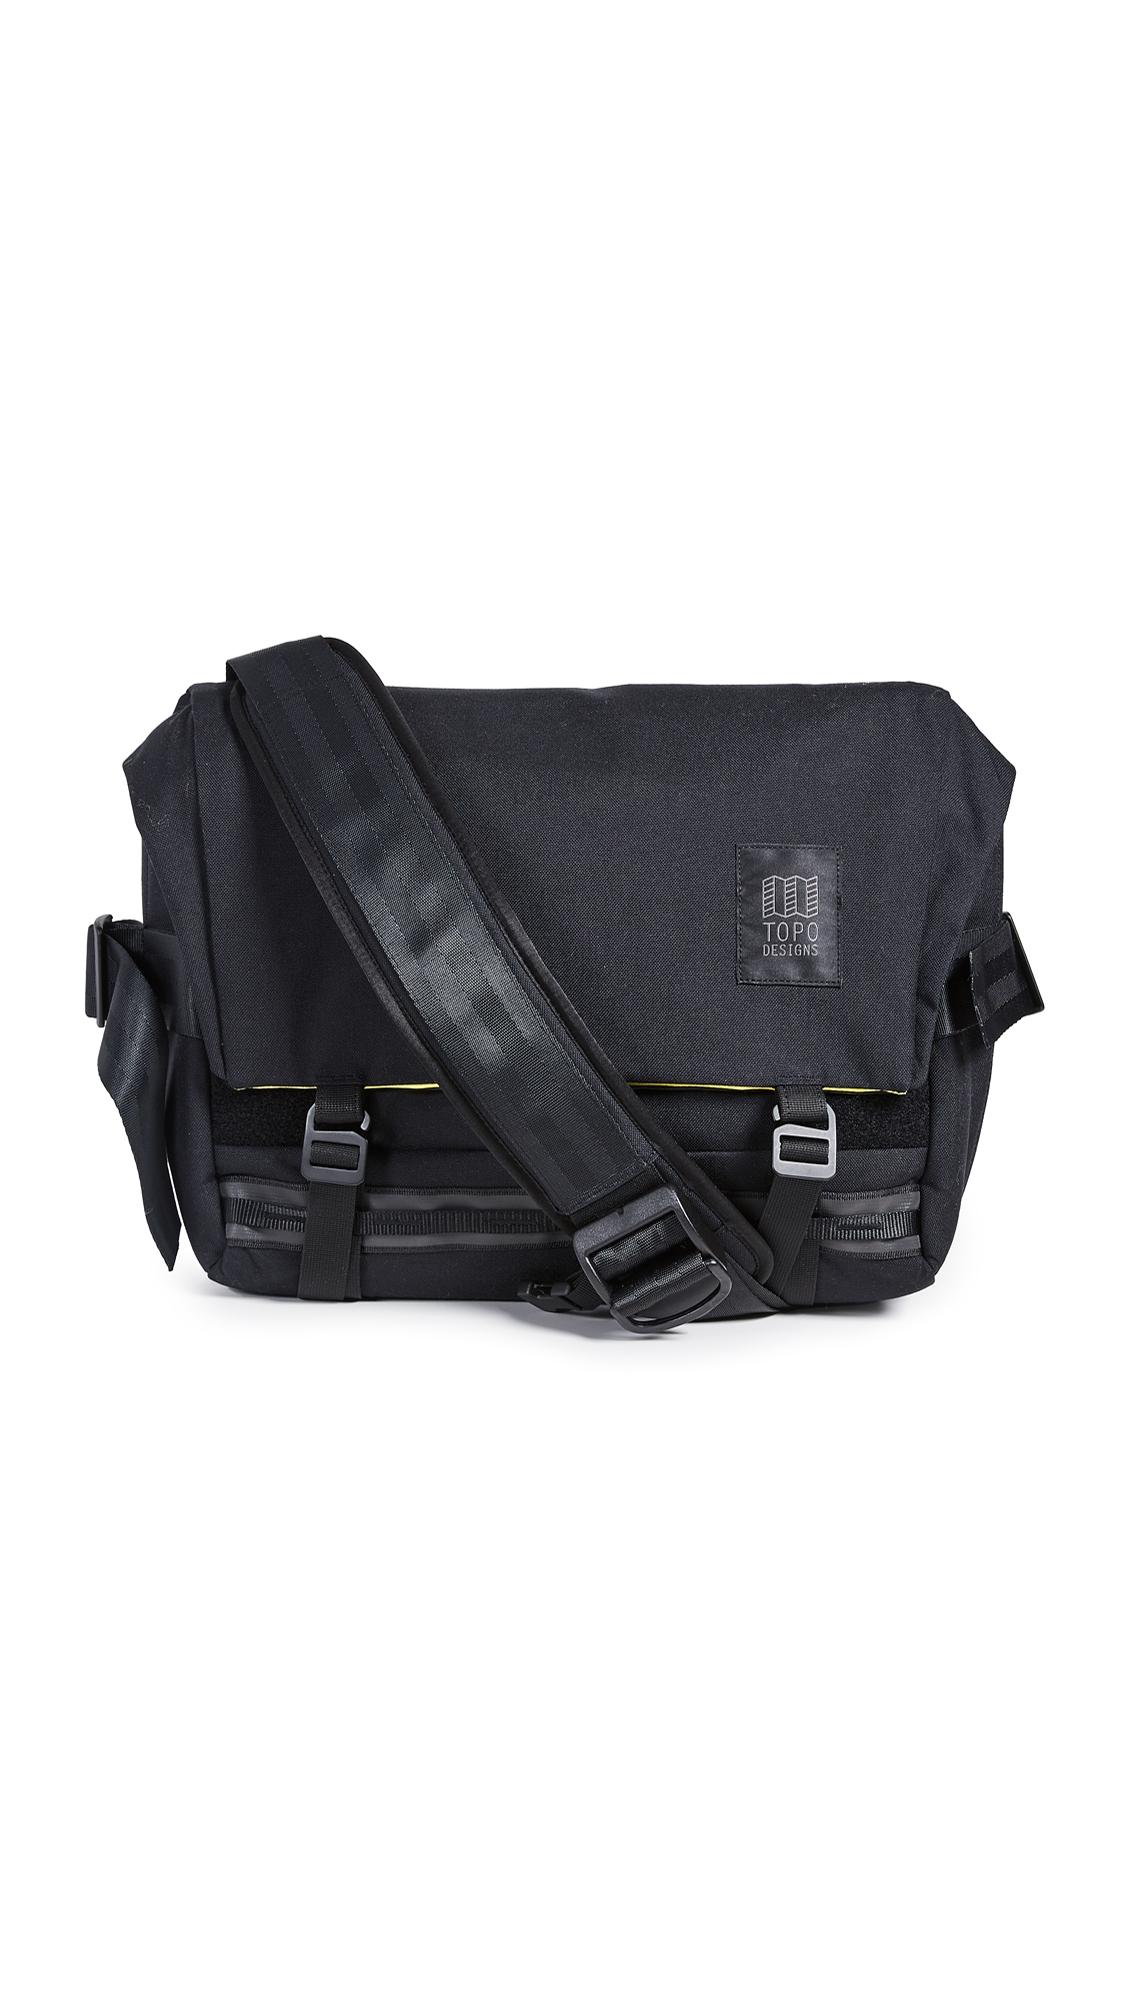 Topo Designs Bags MESSENGER BAG